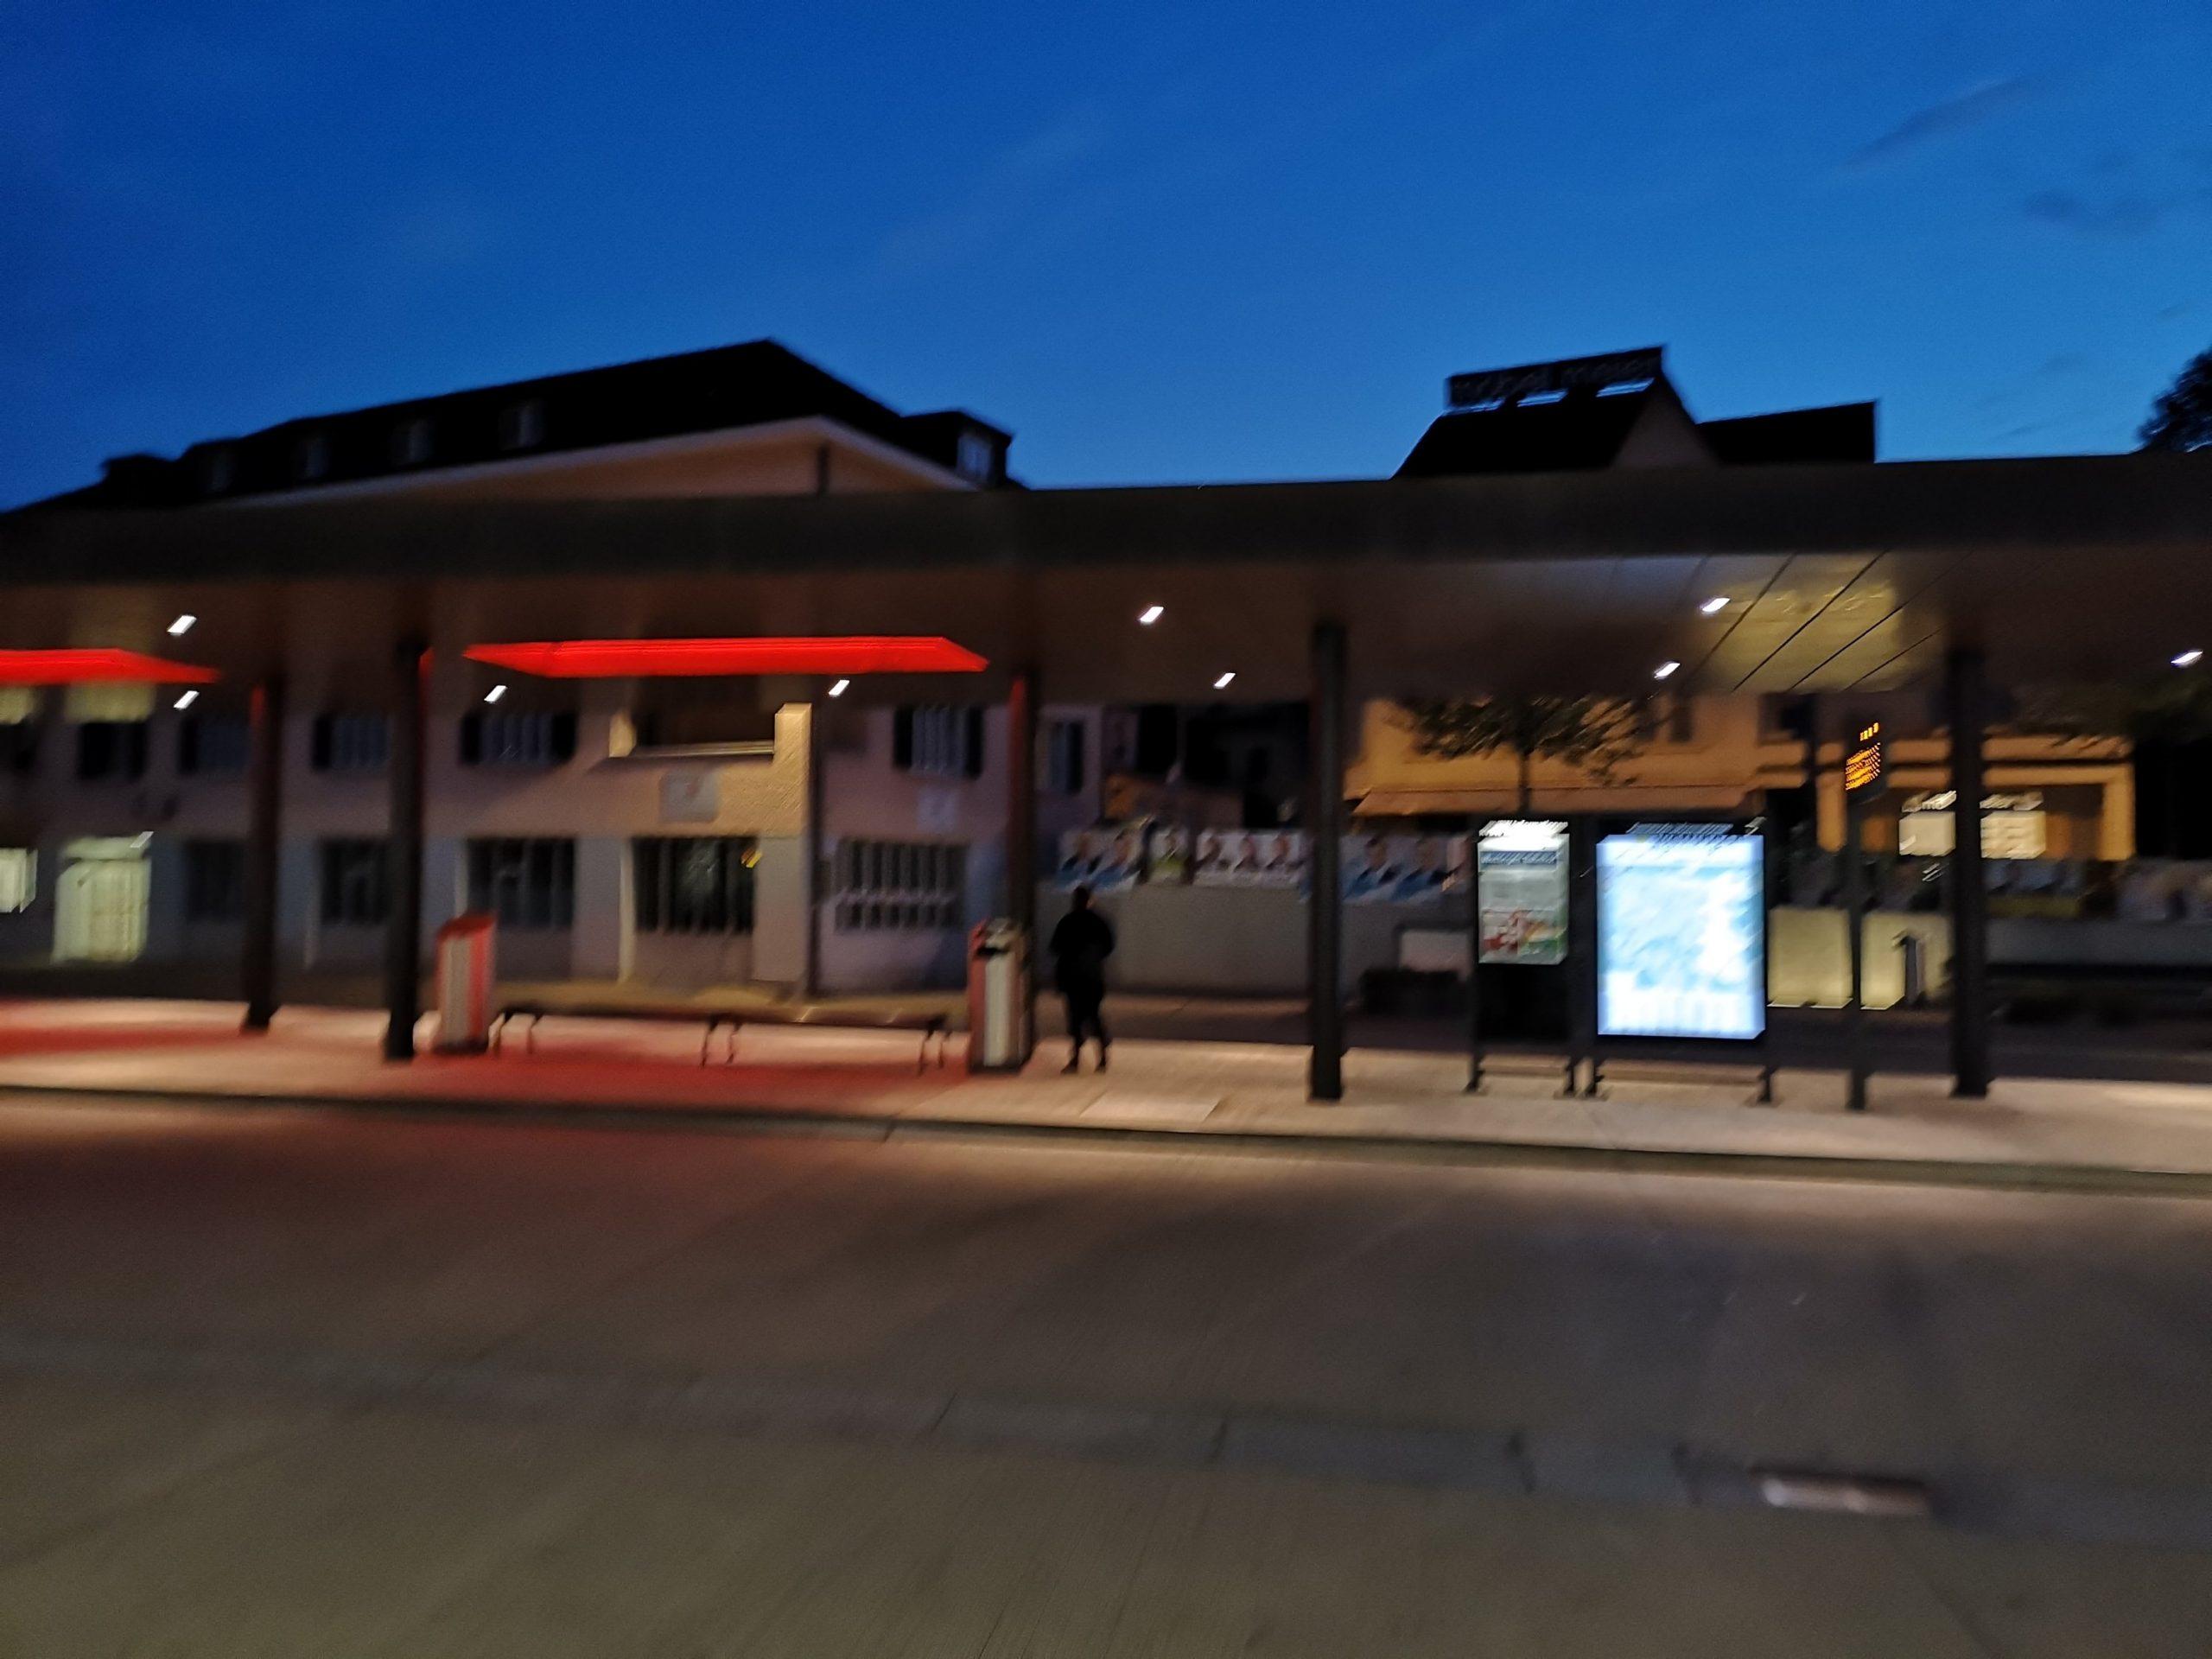 Bahnhof Wettige_20200916_0636.jpg